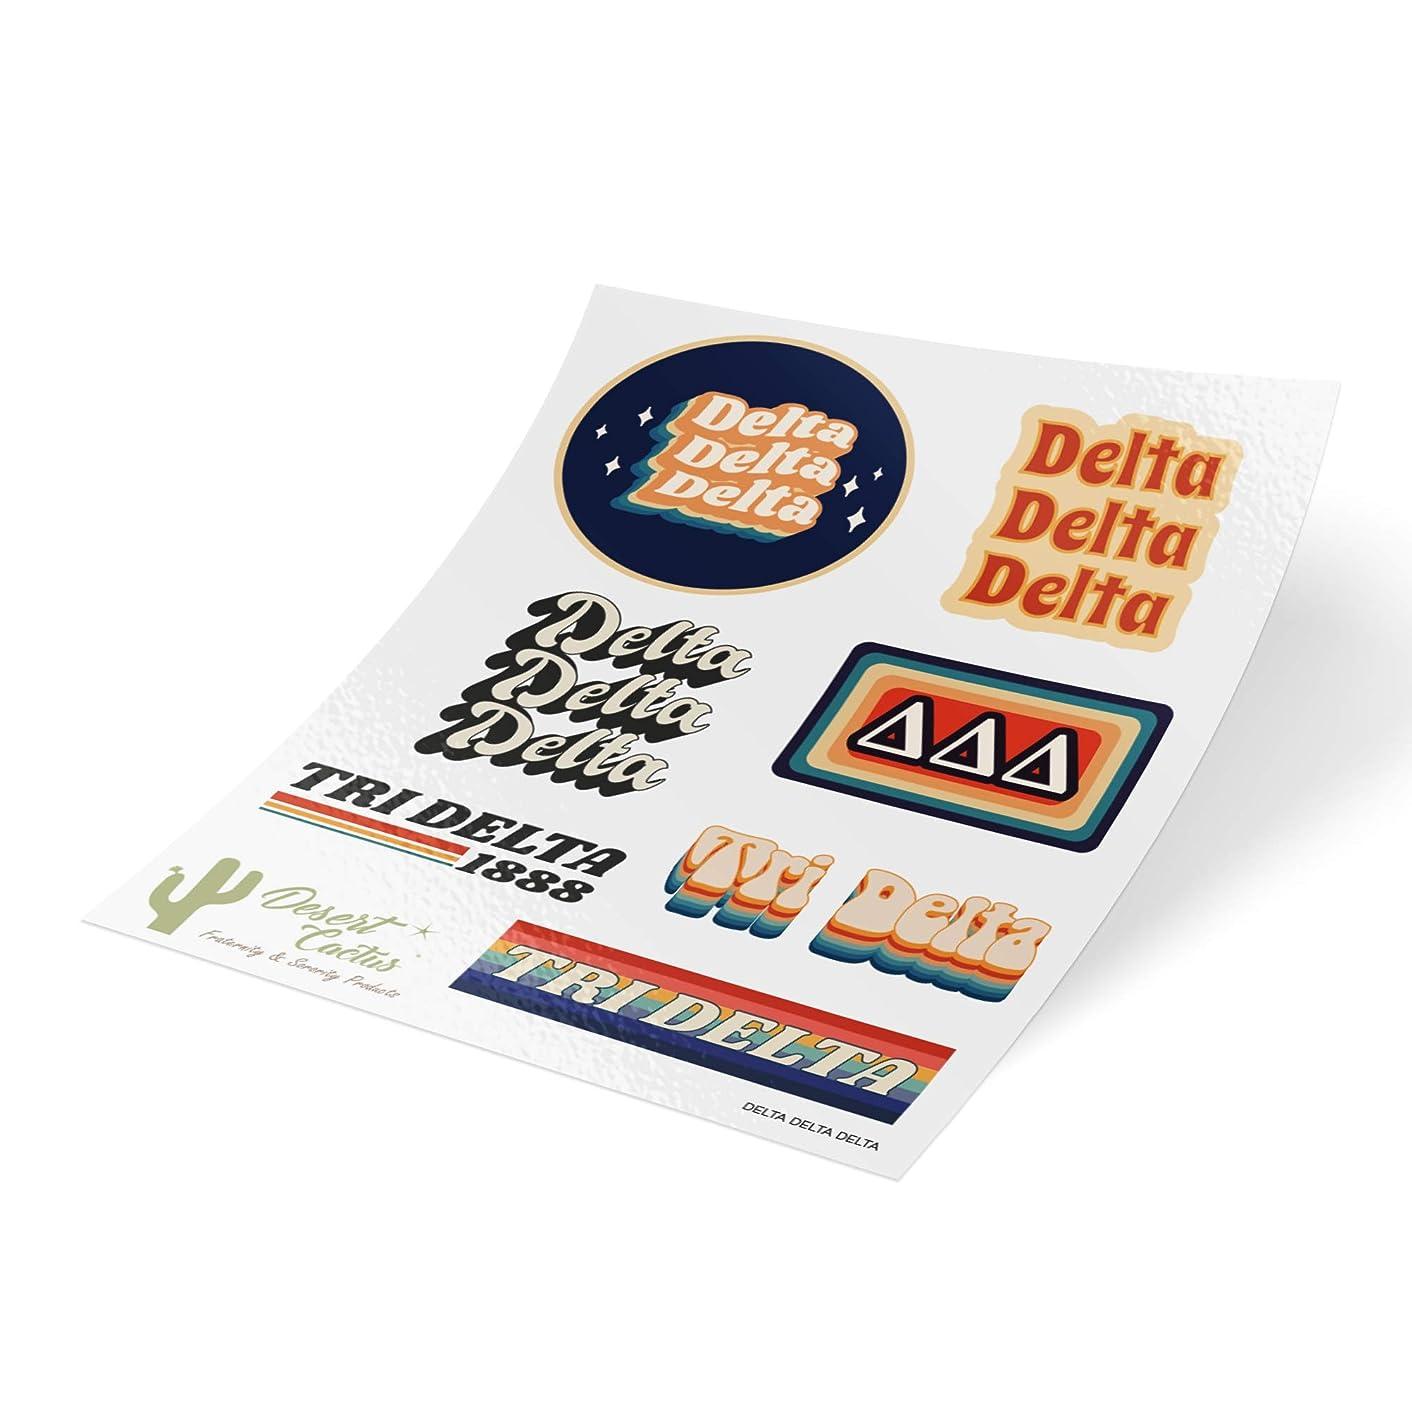 Delta Delta Delta 70's Themed Sticker Sheet Decal Laptop Water Bottle Car tri Delta (Full Sheet - 70's)